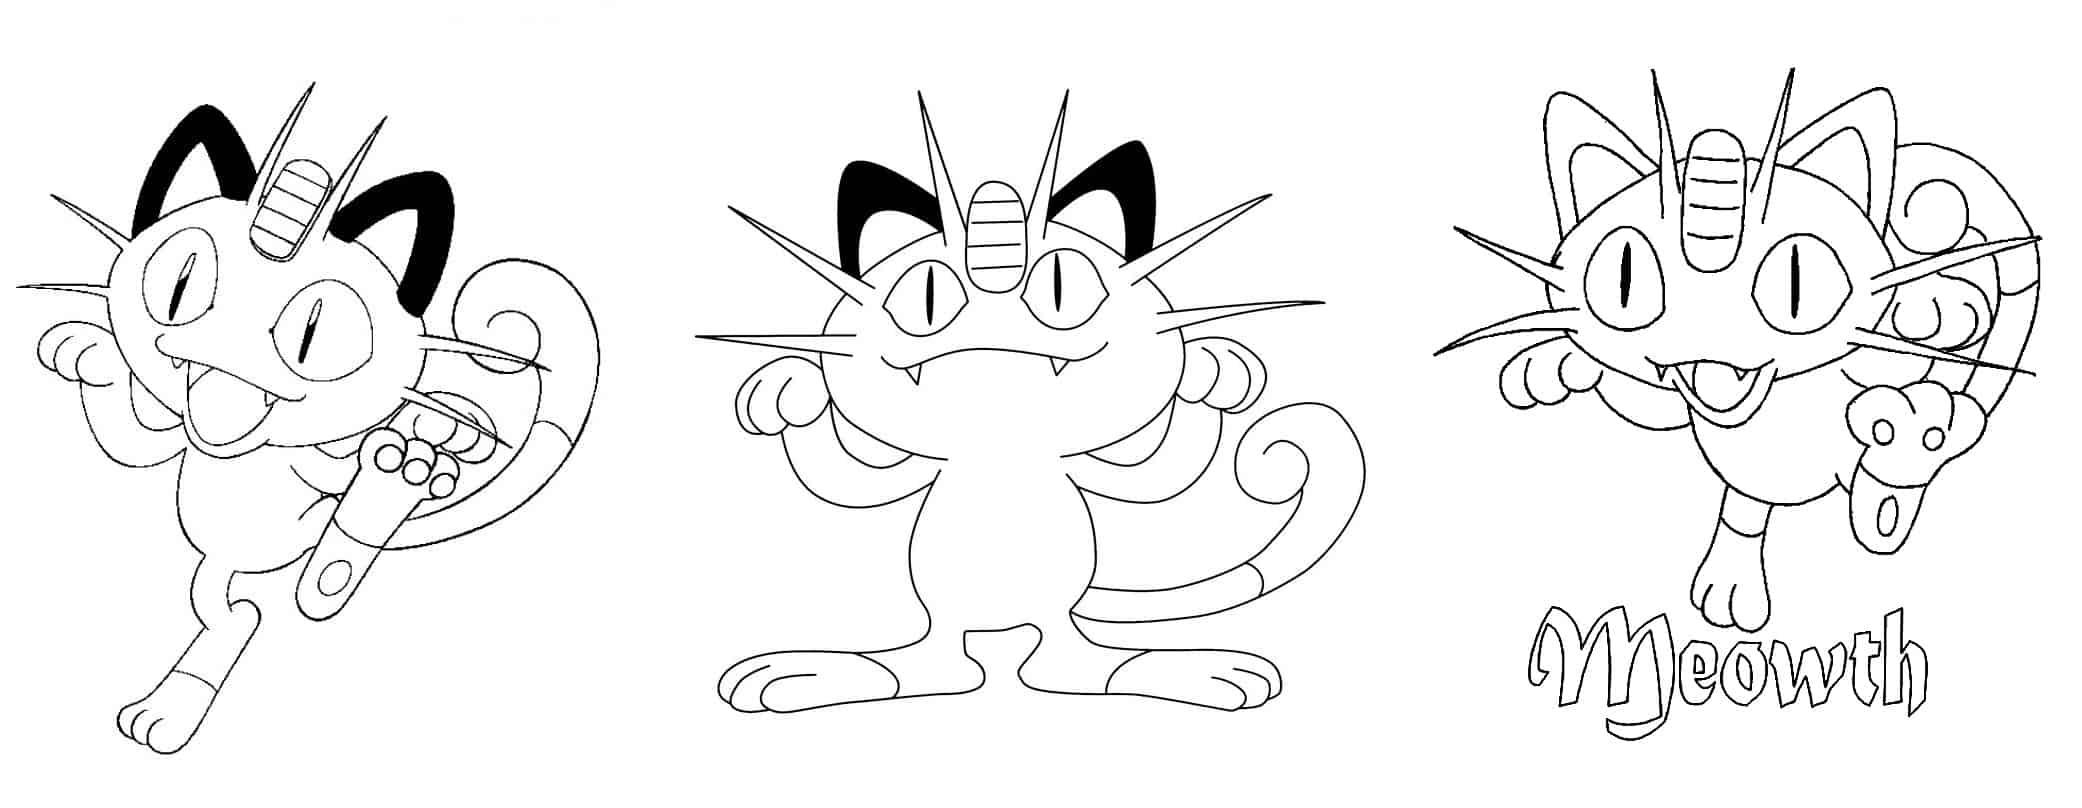 desenhos meowth